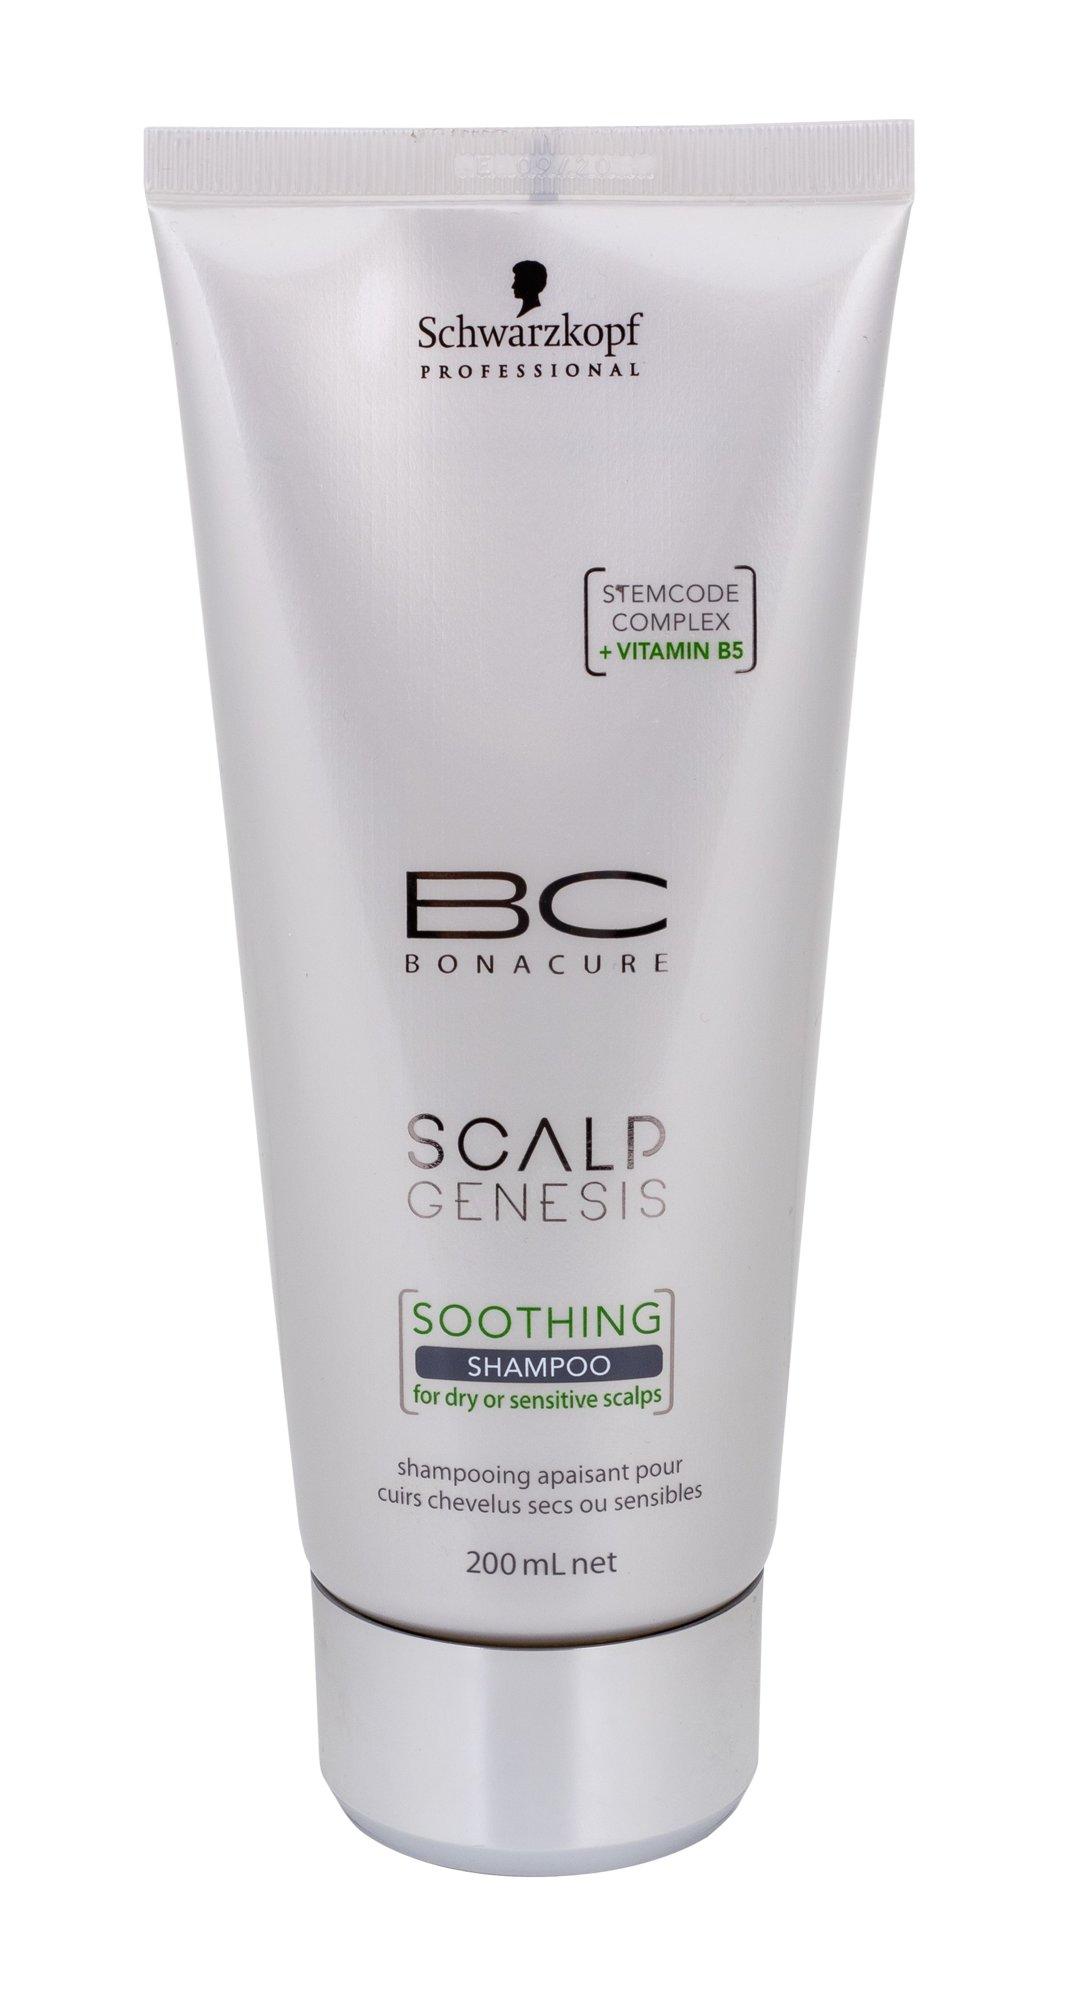 Schwarzkopf BC Bonacure Scalp Genesis Cosmetic 200ml